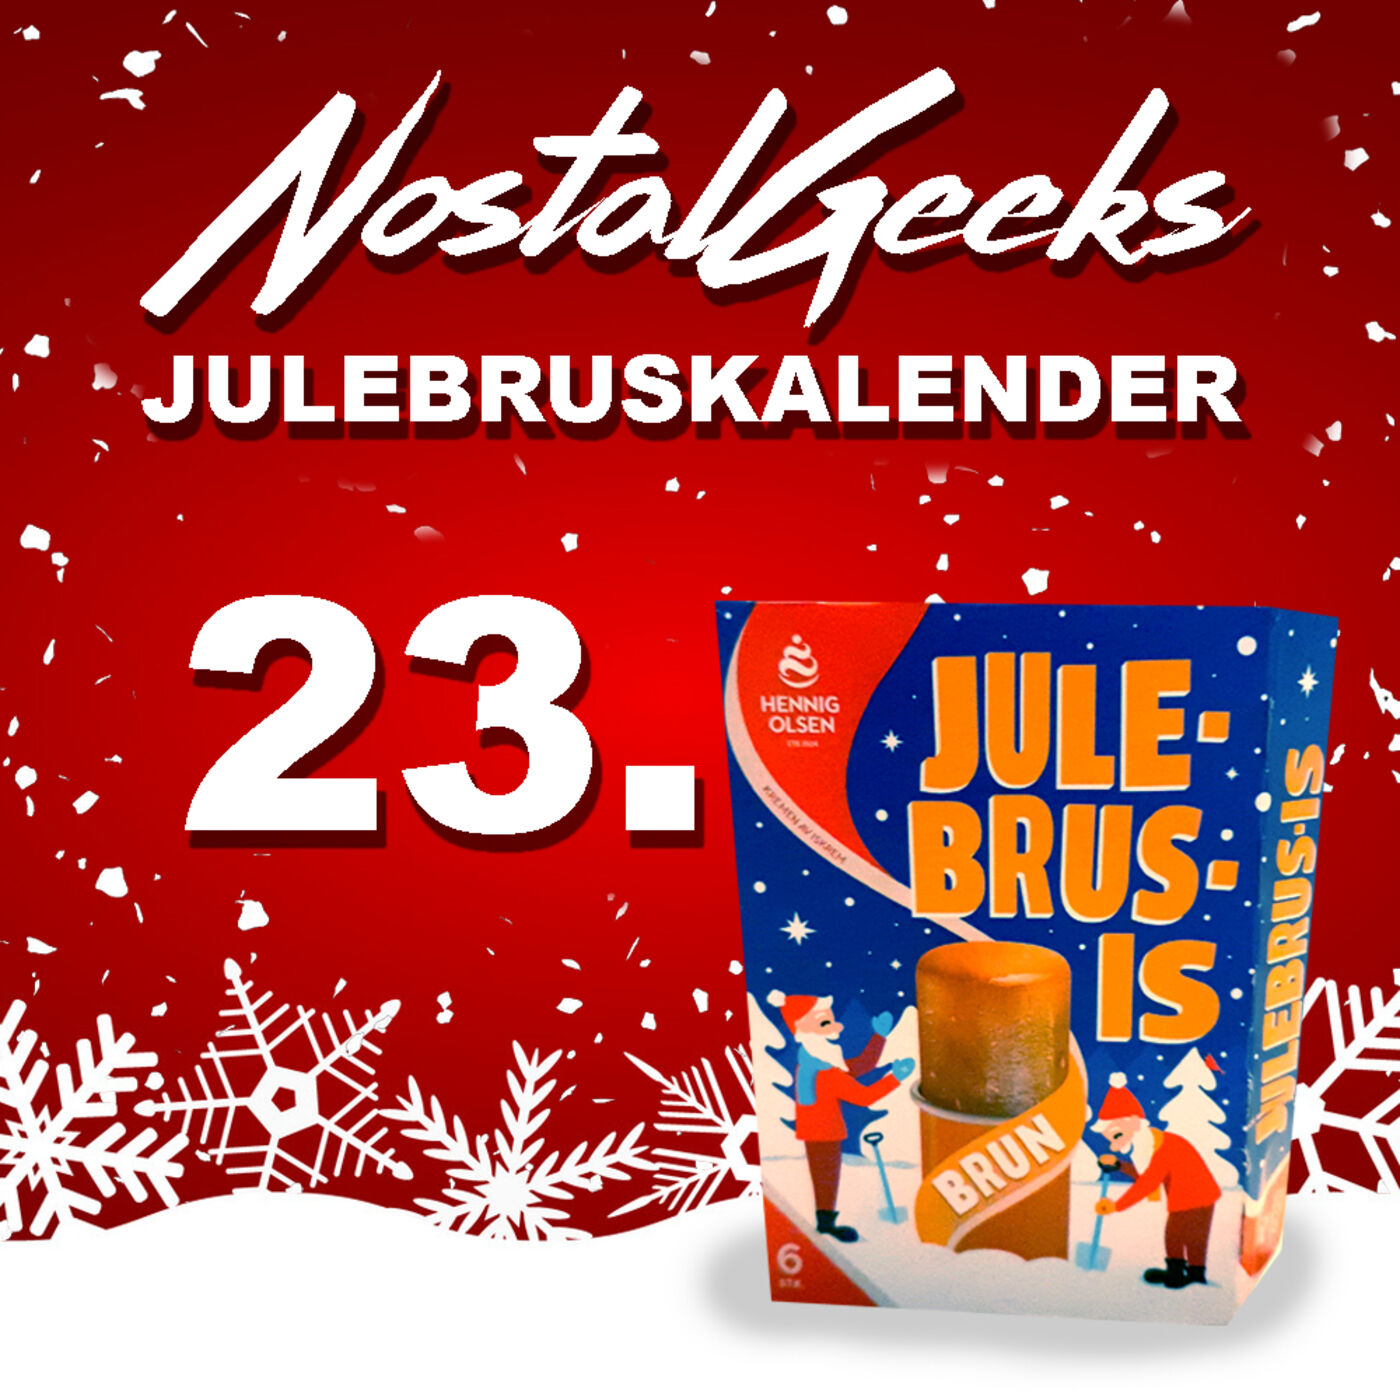 NostalGeeks Julebruskalender - 23 - Hennig-Olsen Julebrus-is